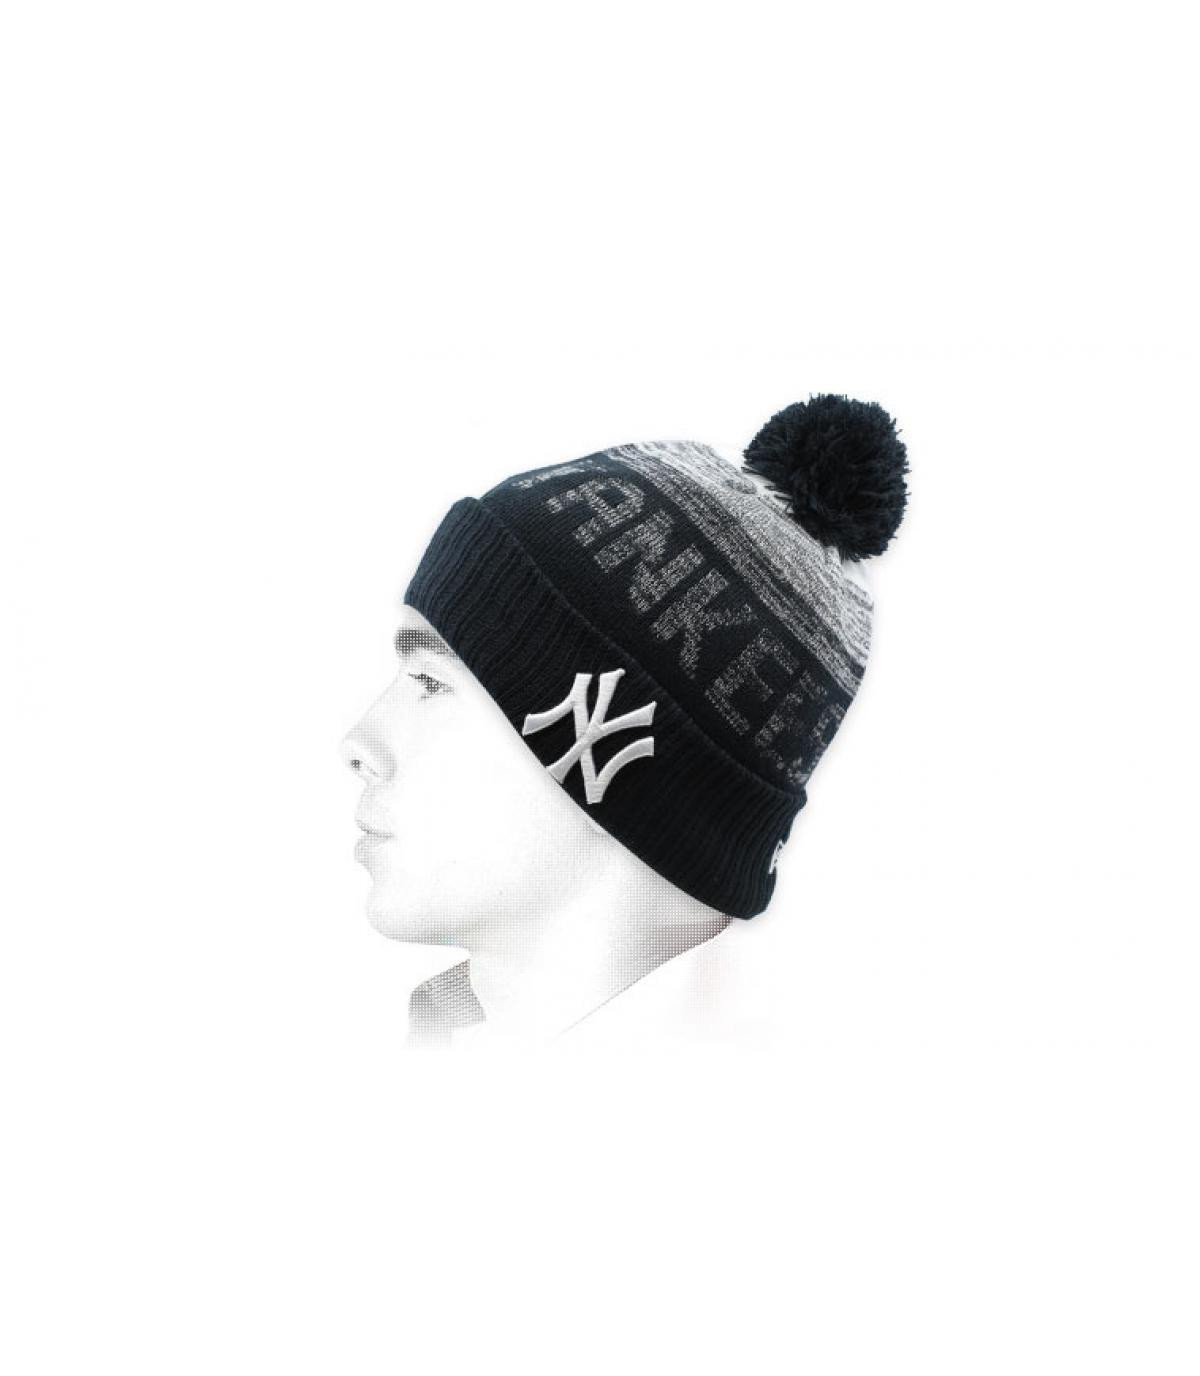 zwarte kwastjes Yankees hoed